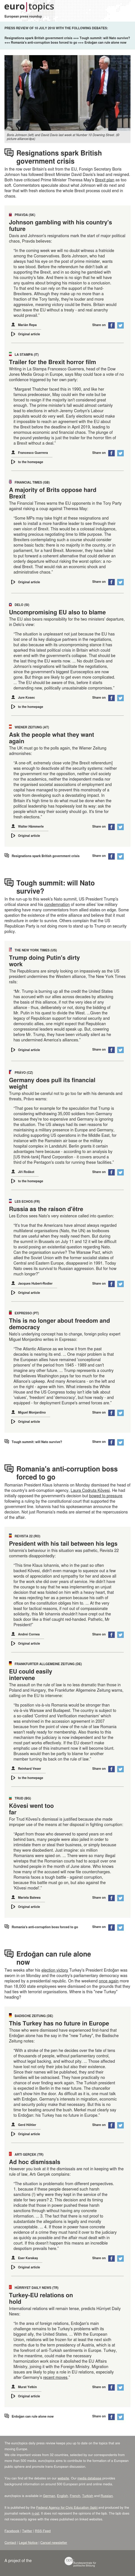 euro|topics: Resignations spark British government crisis (10/07/2018)